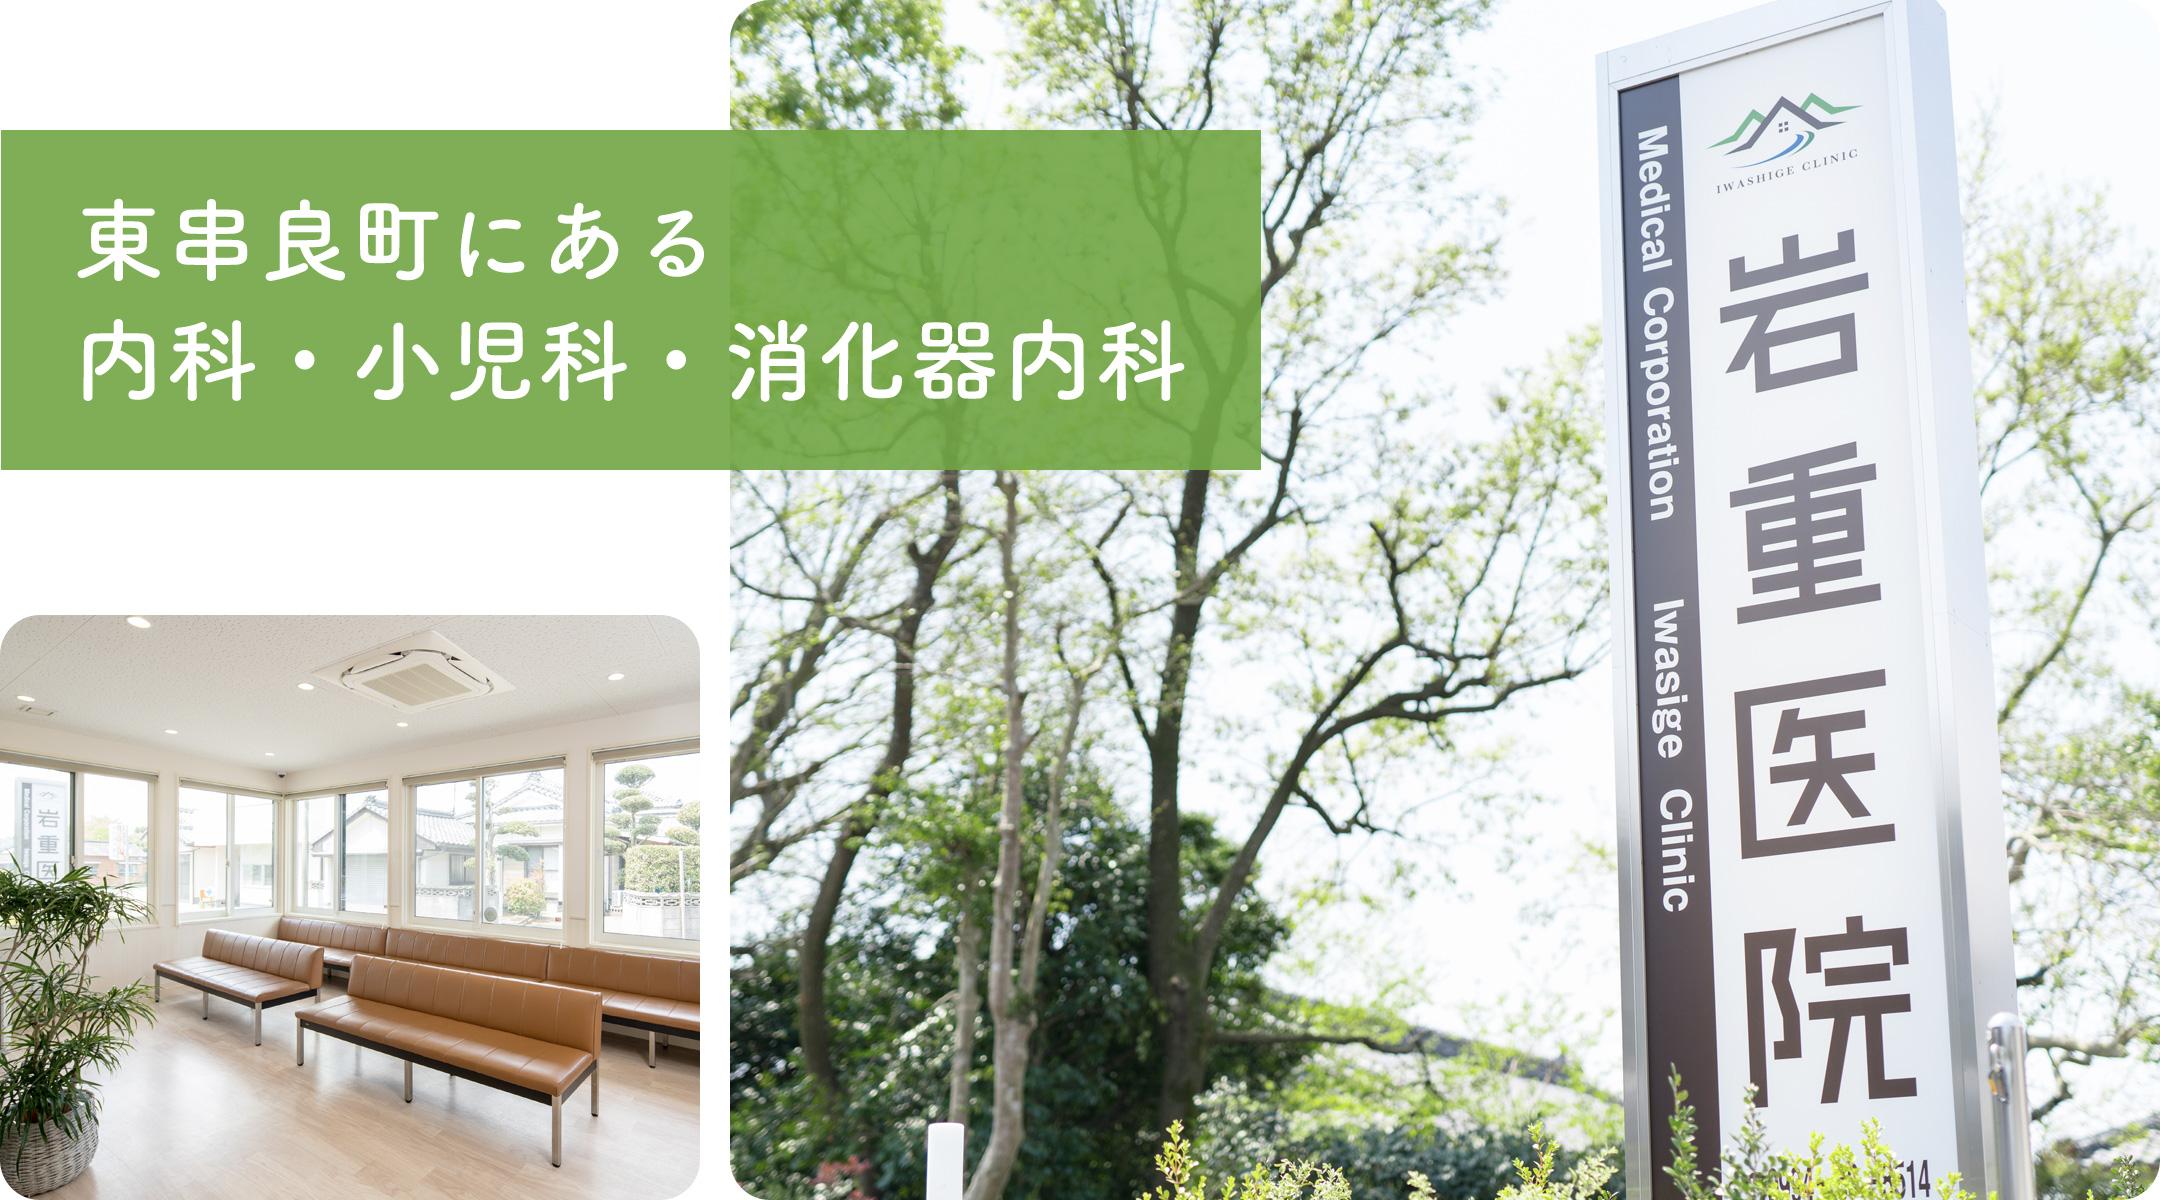 東串良町にある内科・小児科・消化器内科